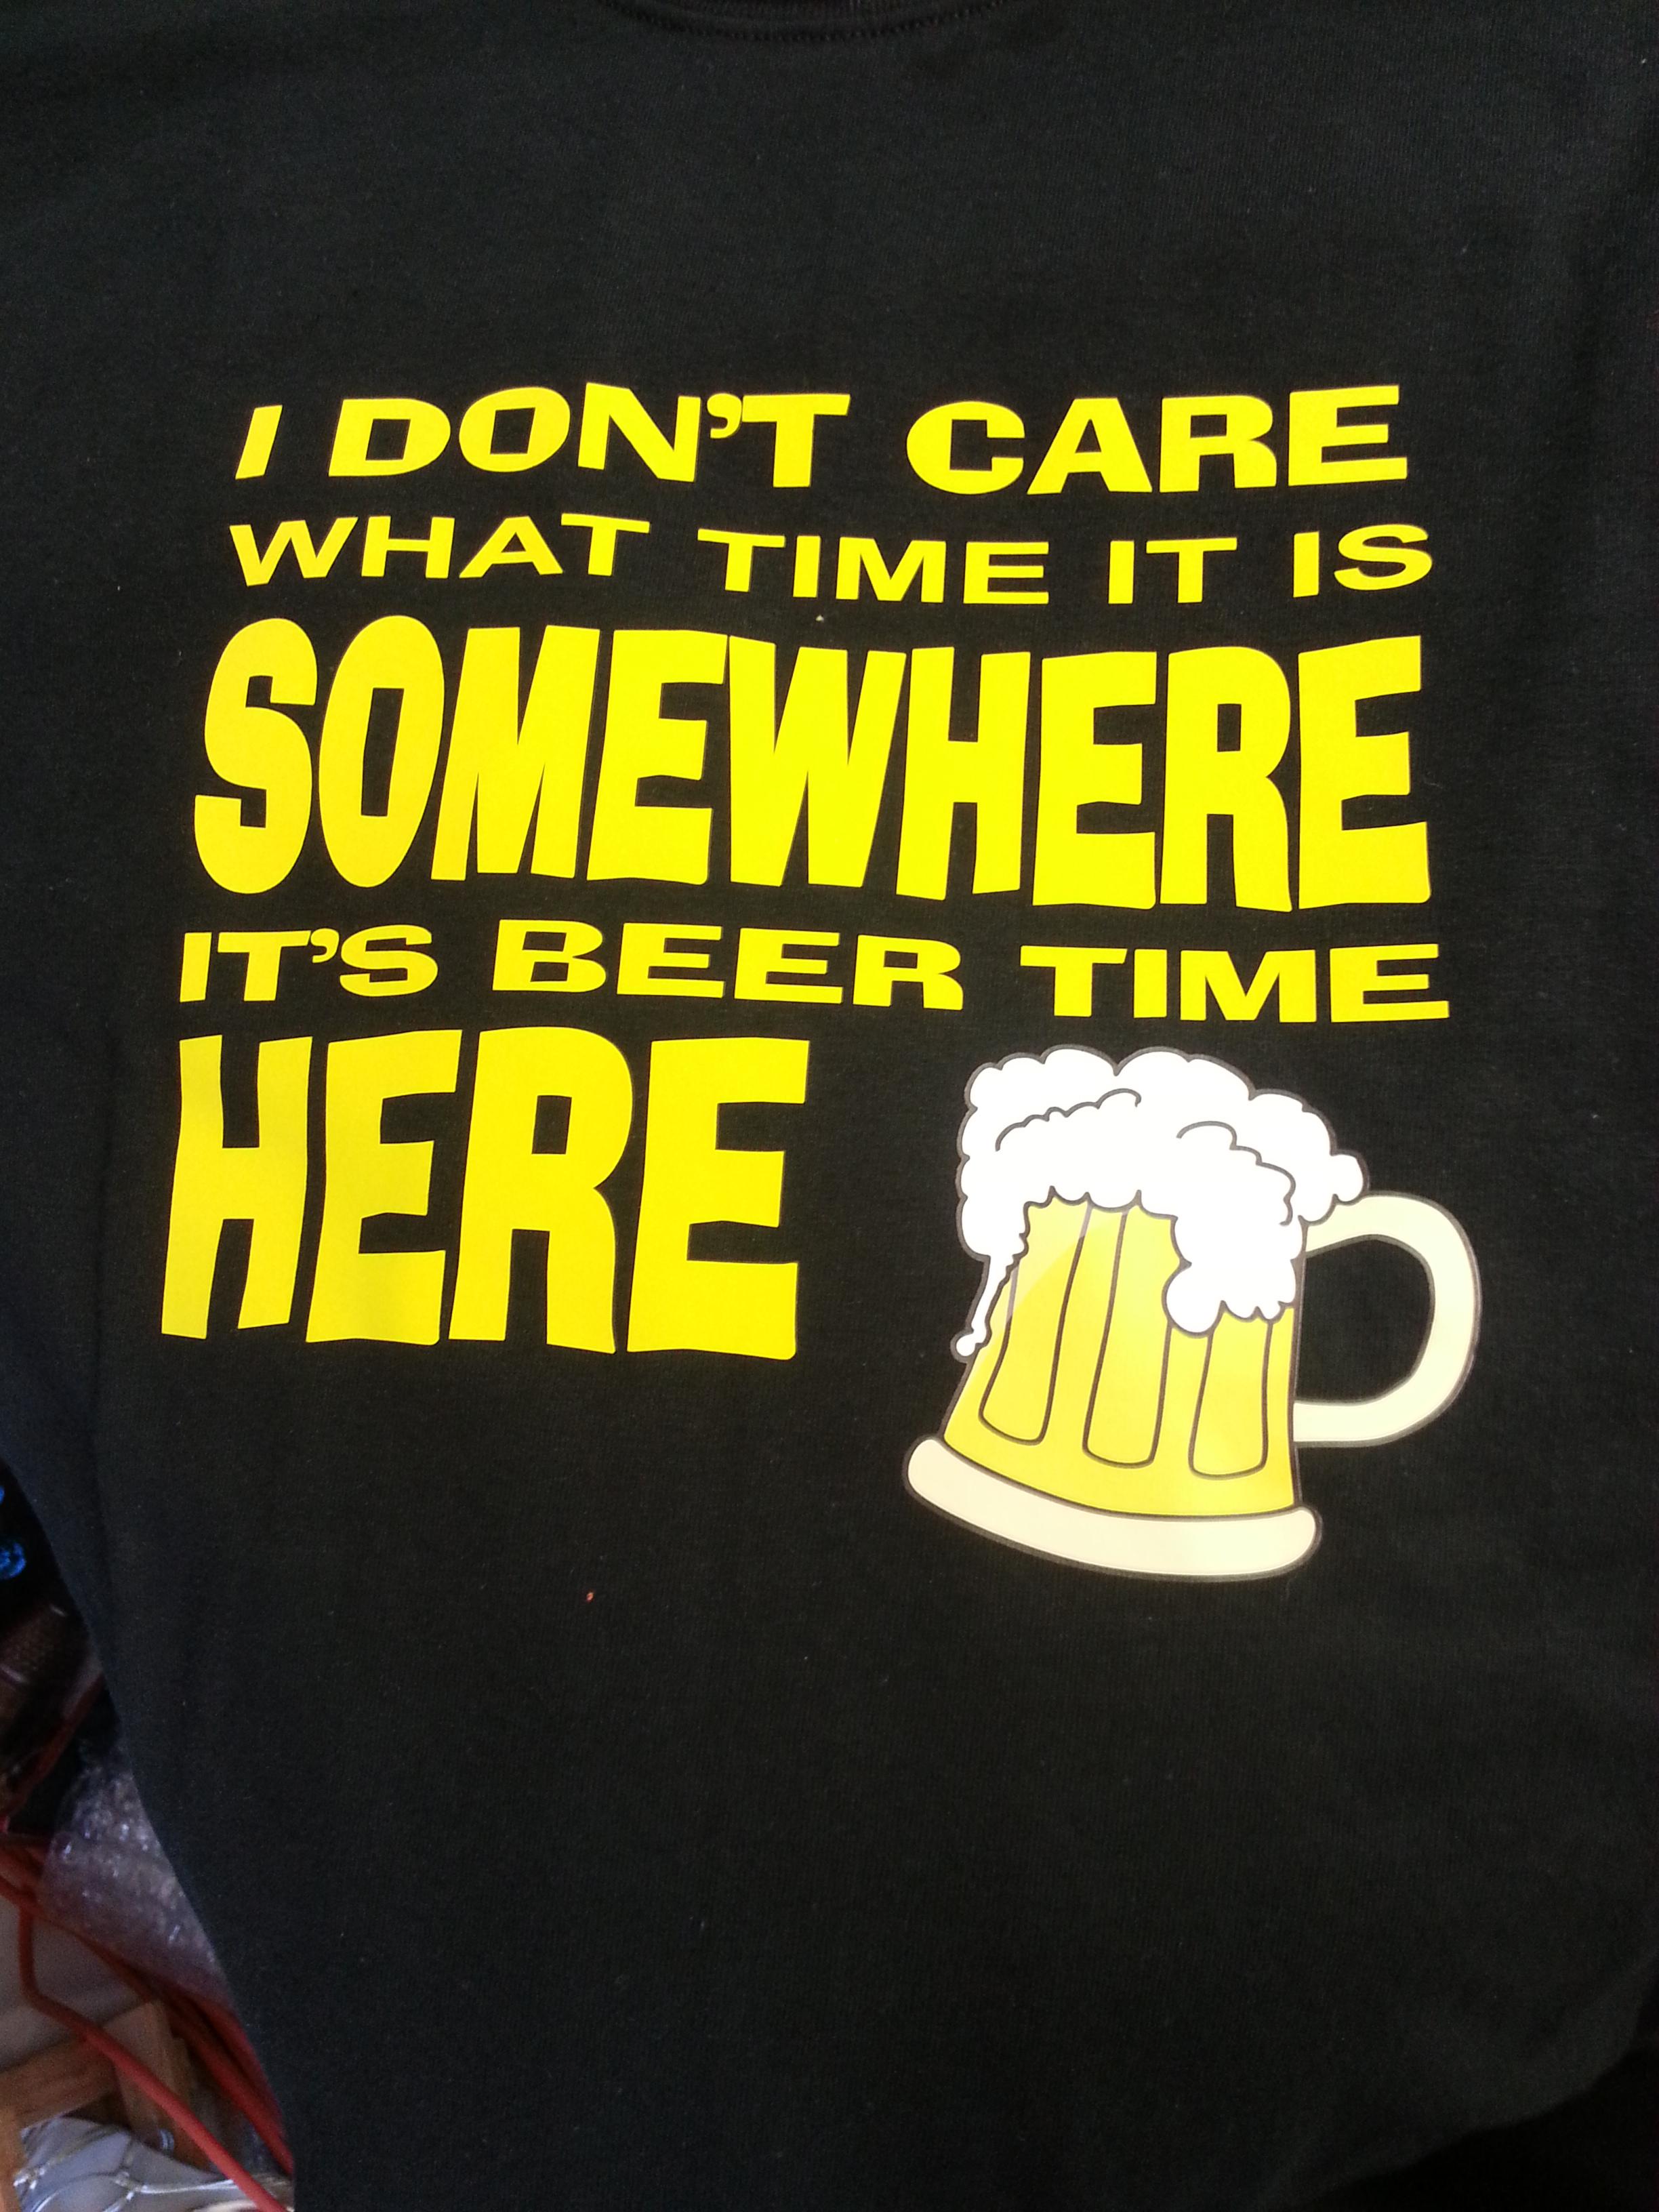 Beer Time!